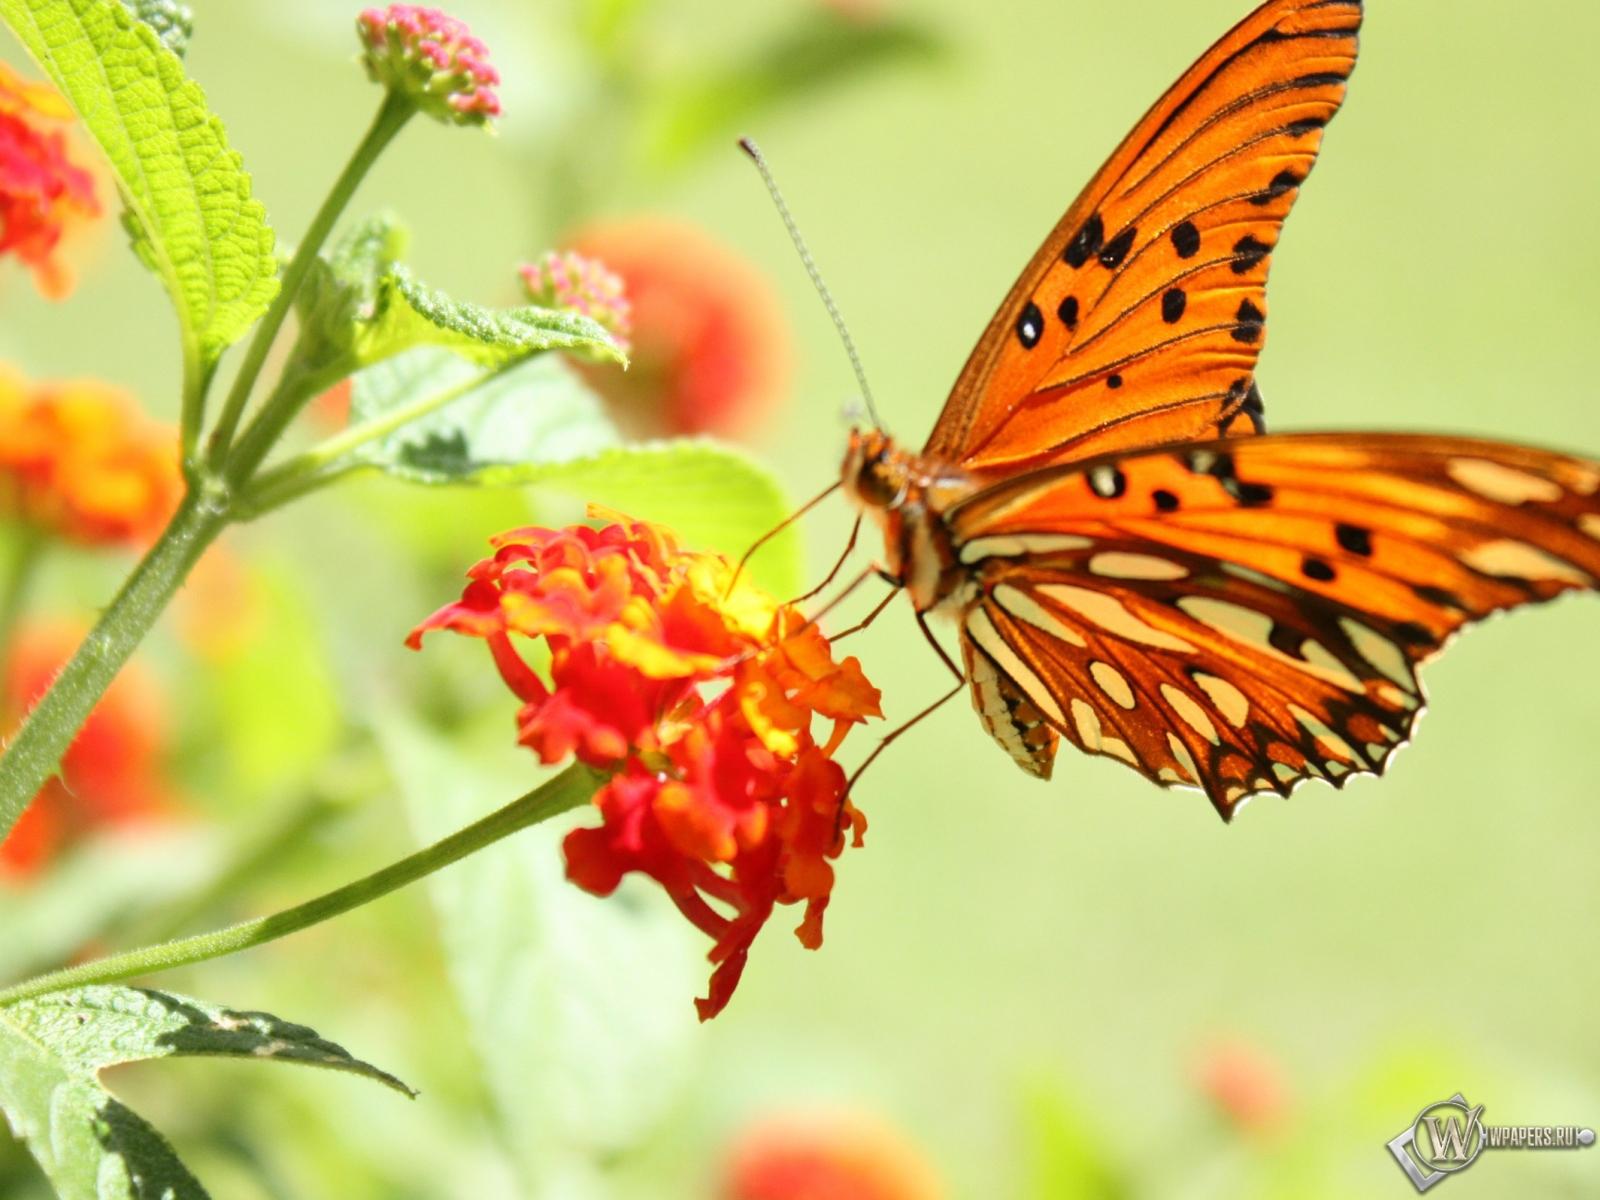 Бабочка на цветке 1600x1200